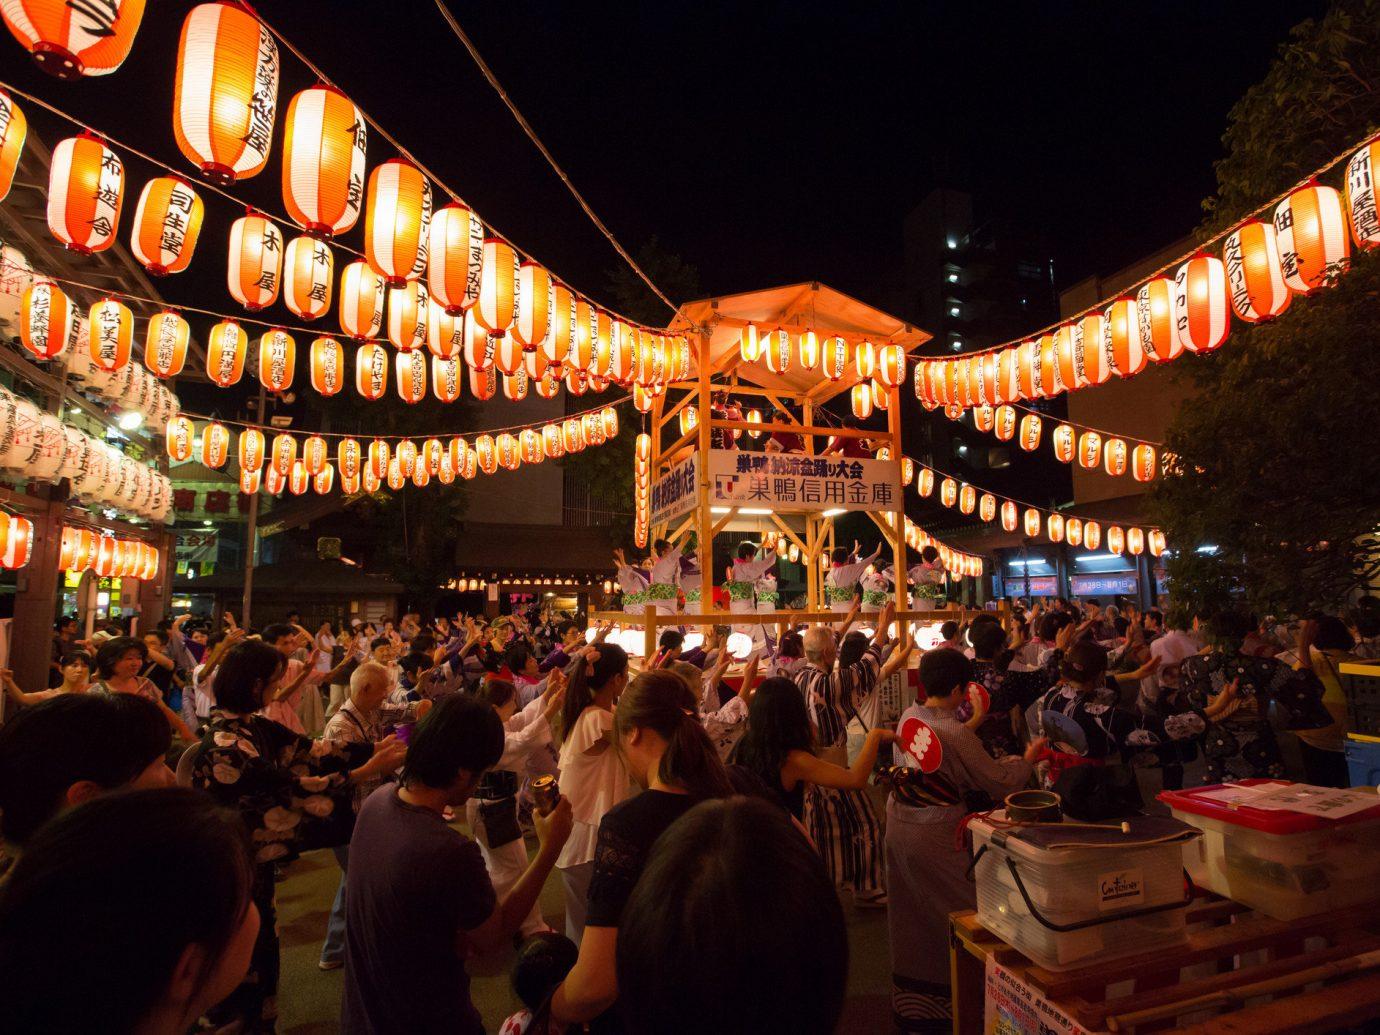 Arts + Culture Festivals + Events Travel Tips person crowd night people lighting festival City fête fun fair event evening